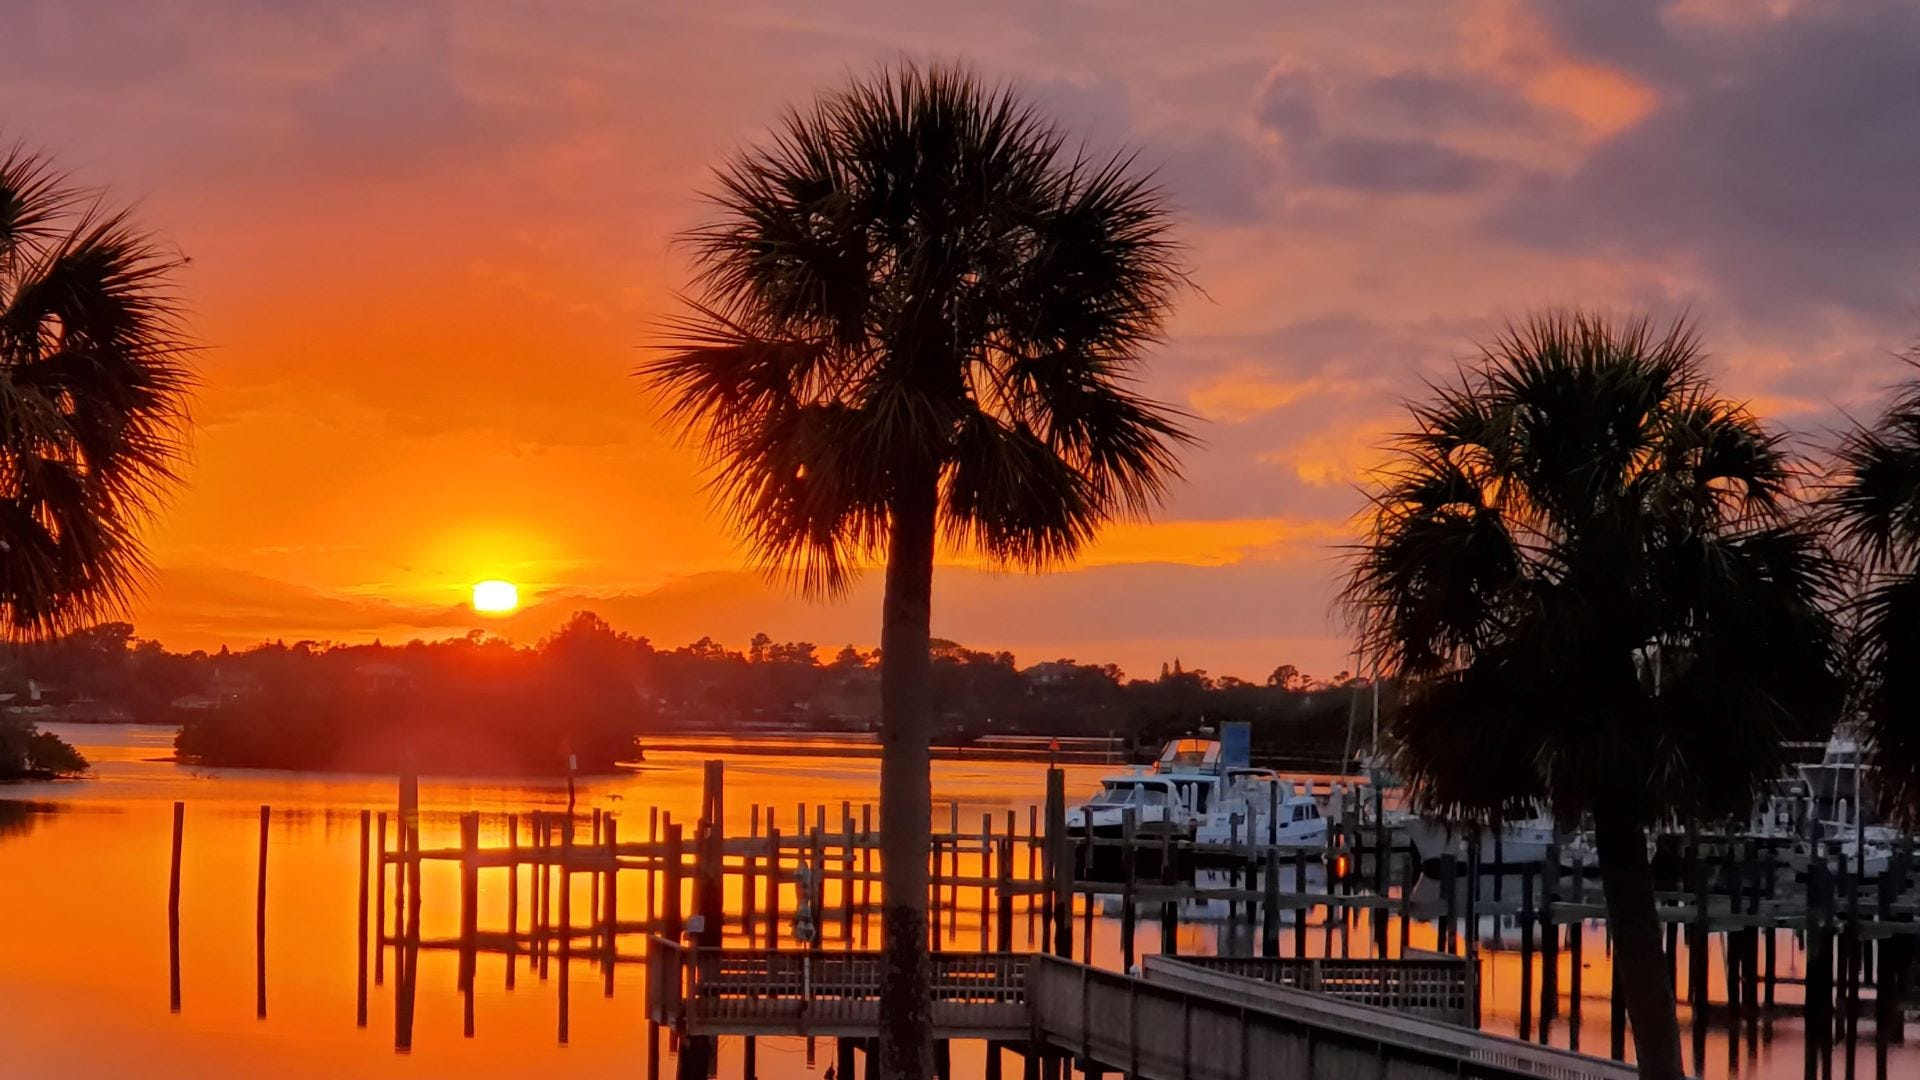 Sunset at the dock in Tarpon Springs, Florida.